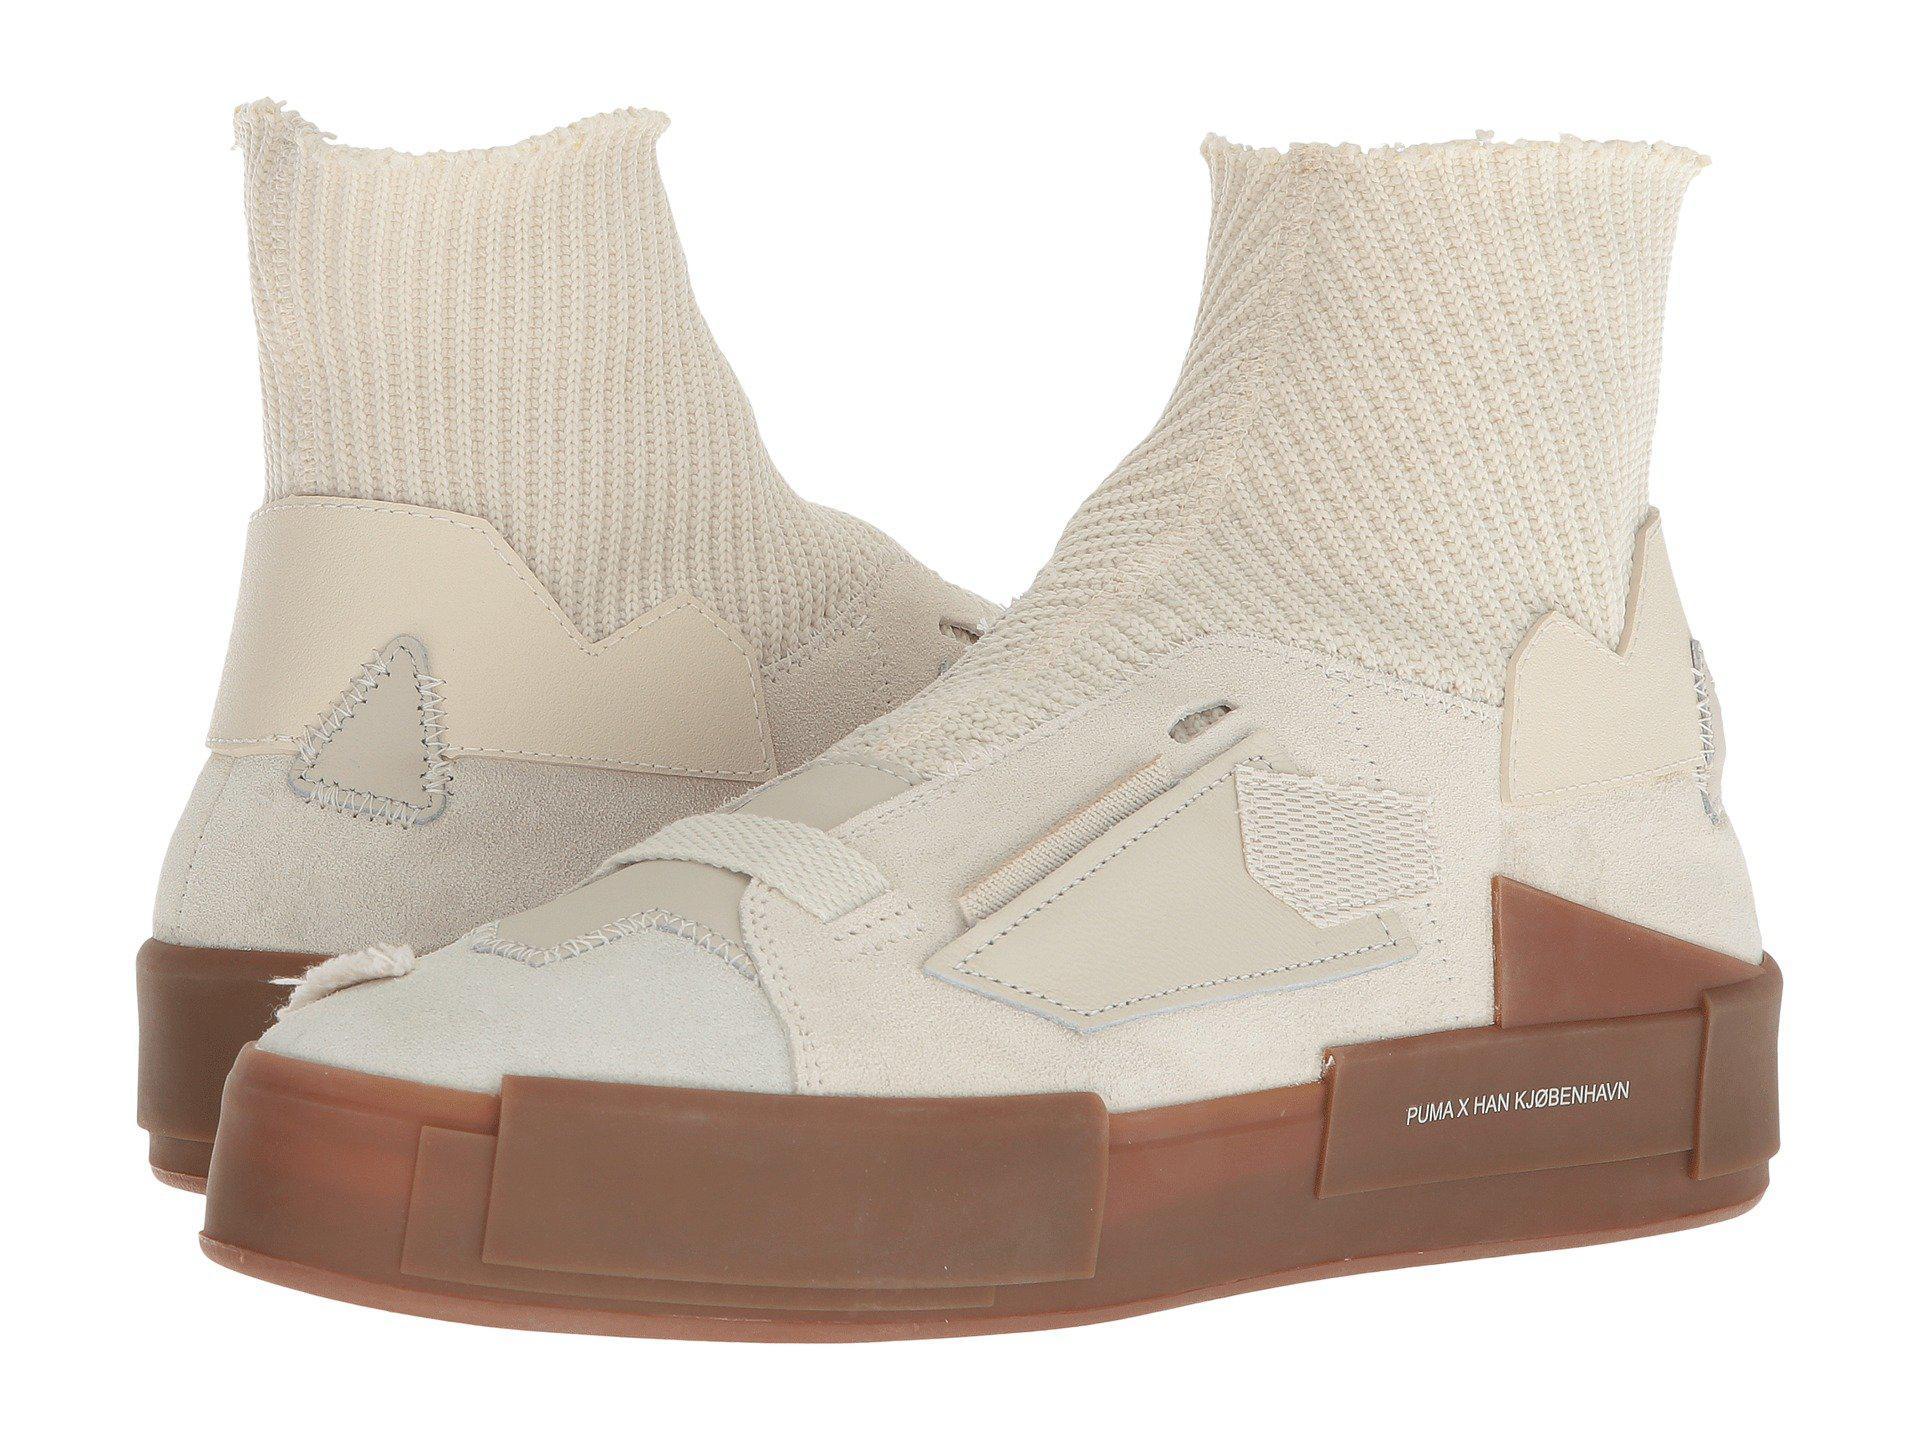 PUMAPuma x Han KJ?BENHAVN Court Platform Sneaker lZ6Dh1u